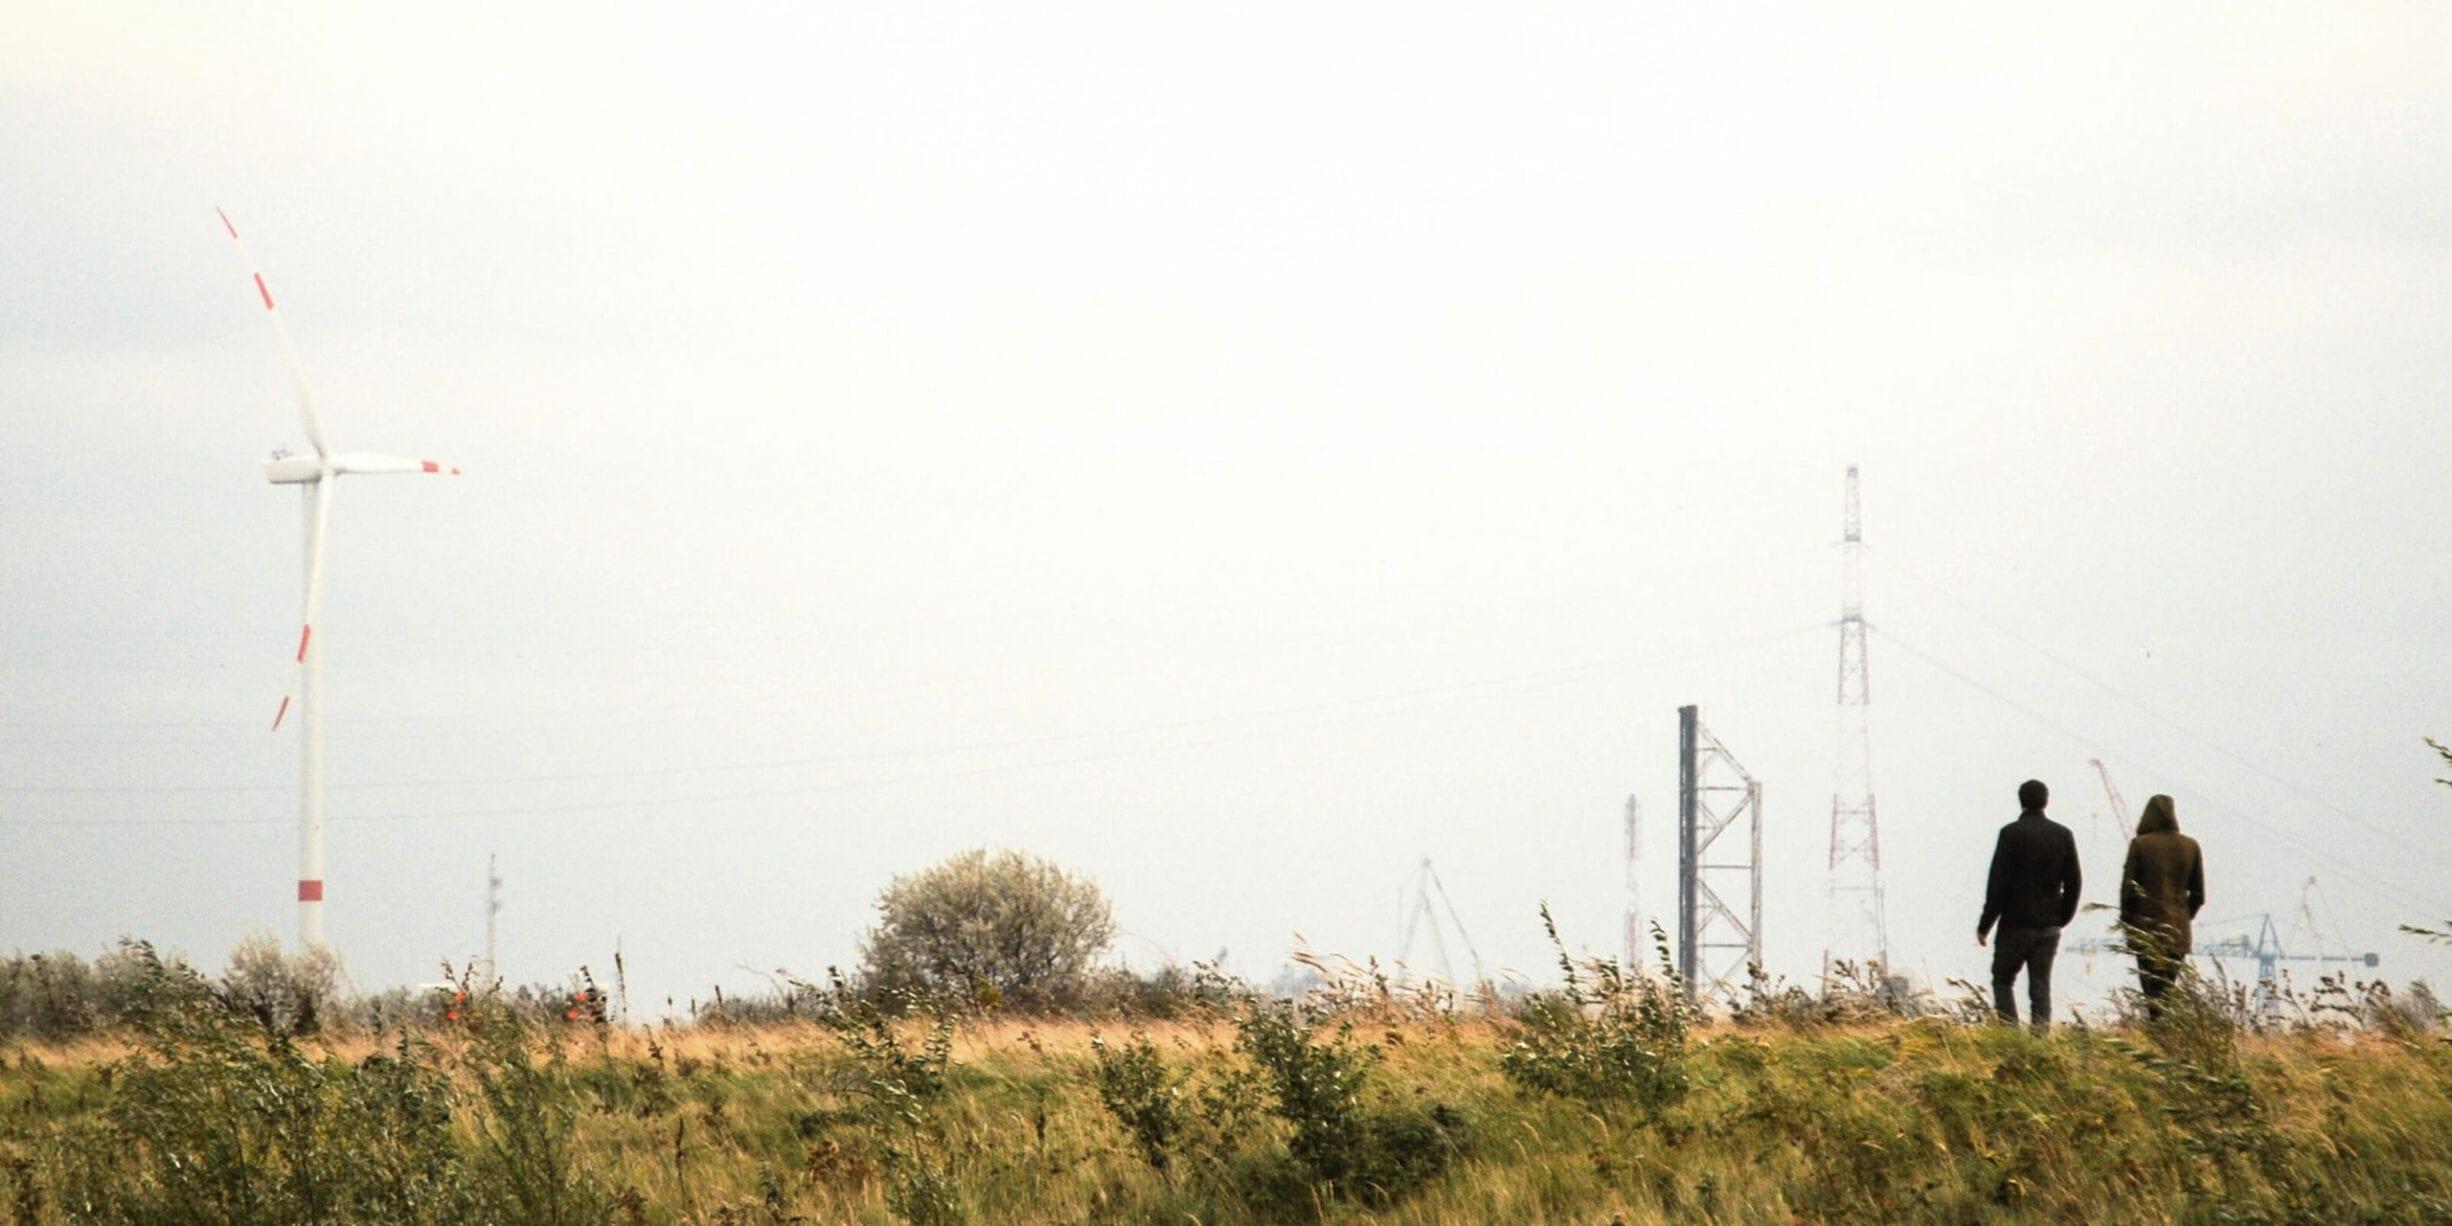 couple walking in field with wind turbines